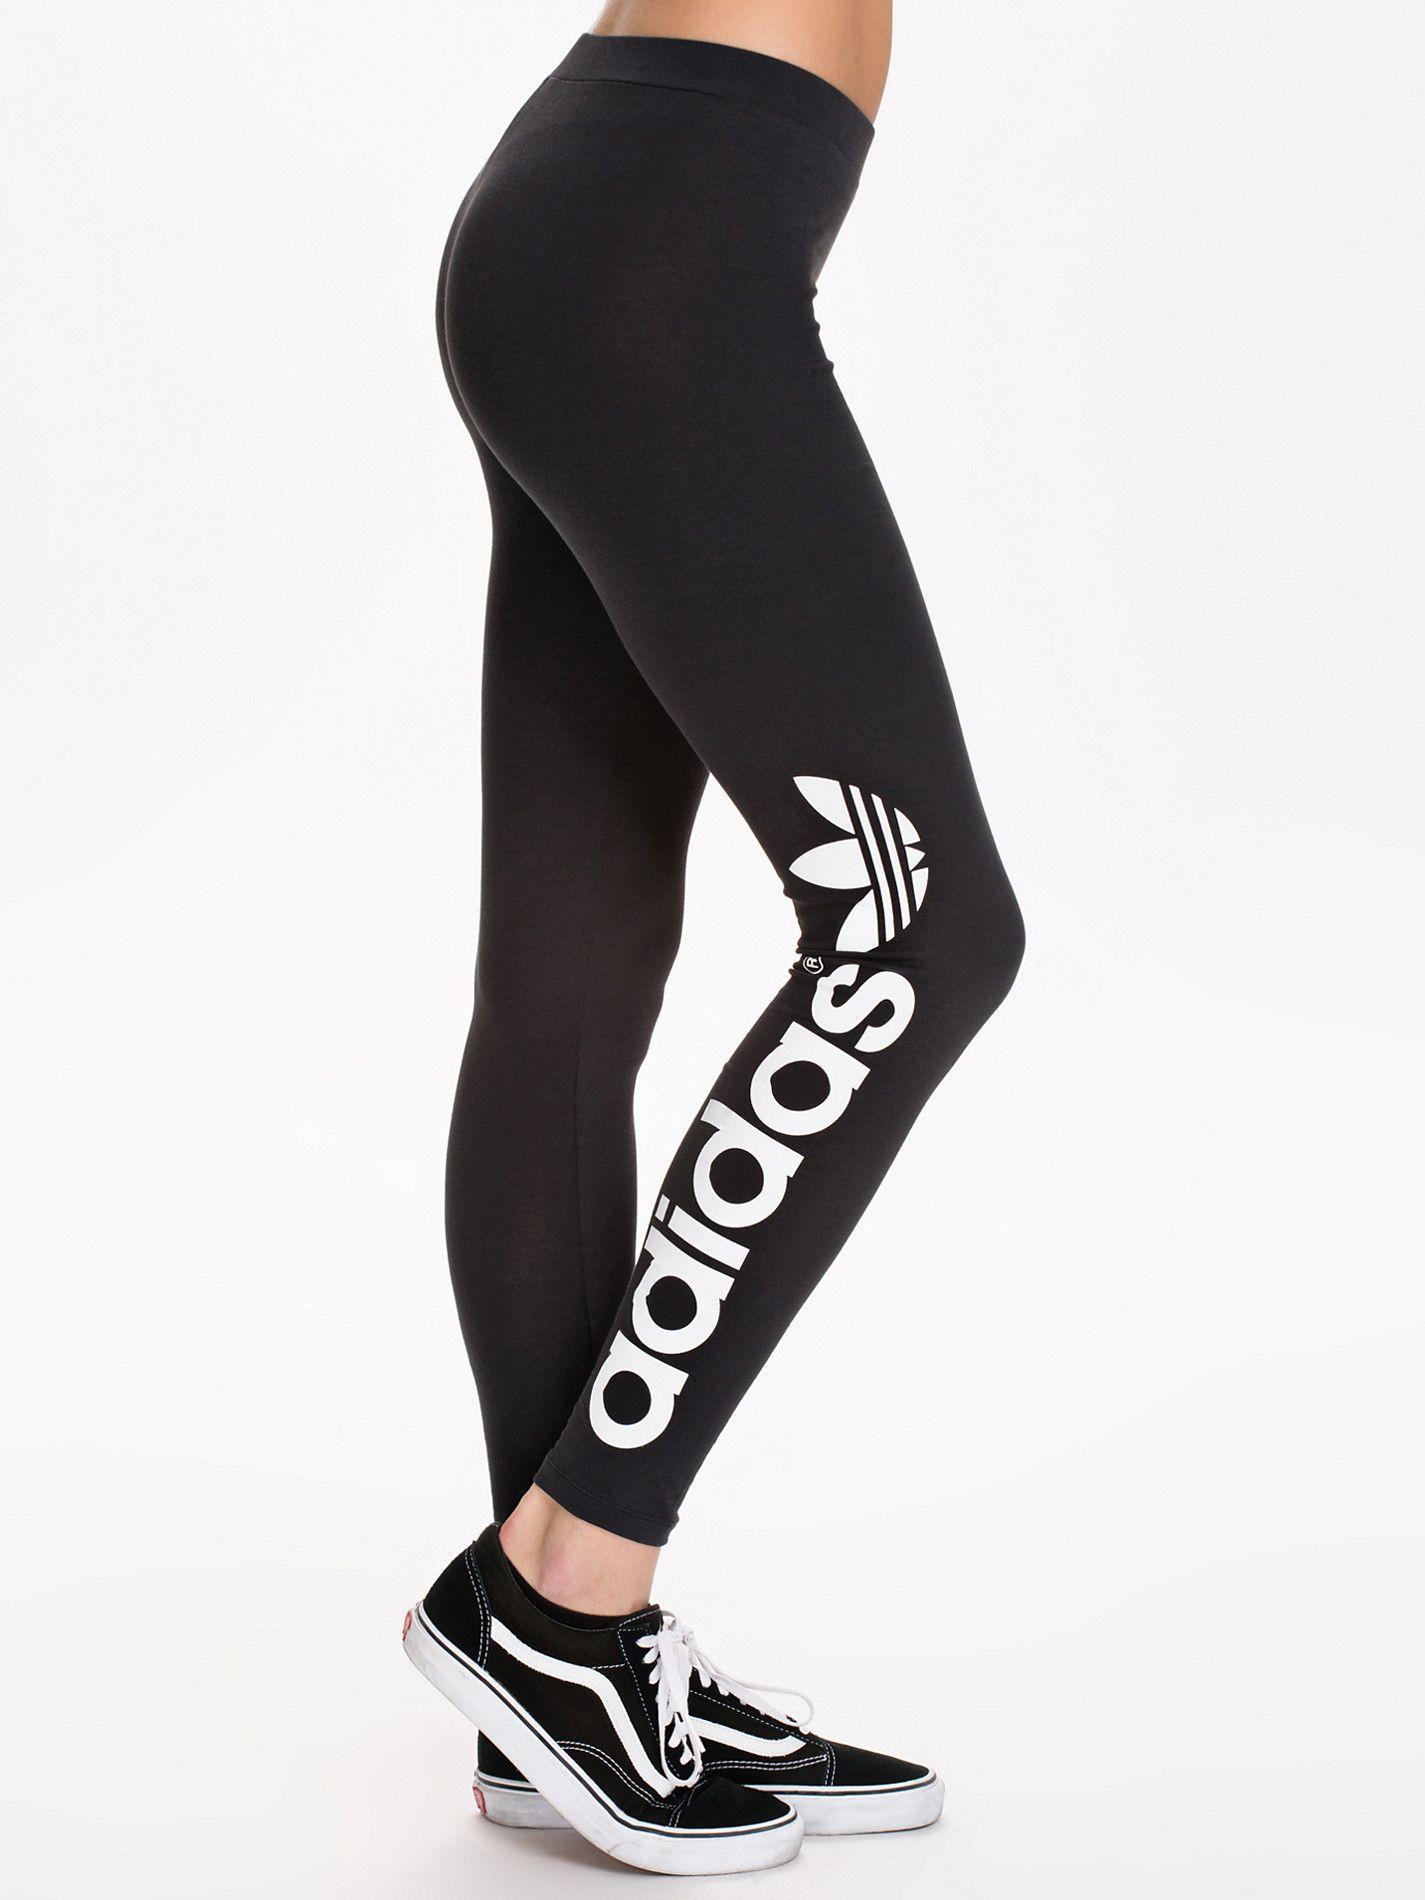 Trefoil Leggings - Adidas Originals - Black White - Leggings - Clothing -  Women - Nelly.com d6ae88a597